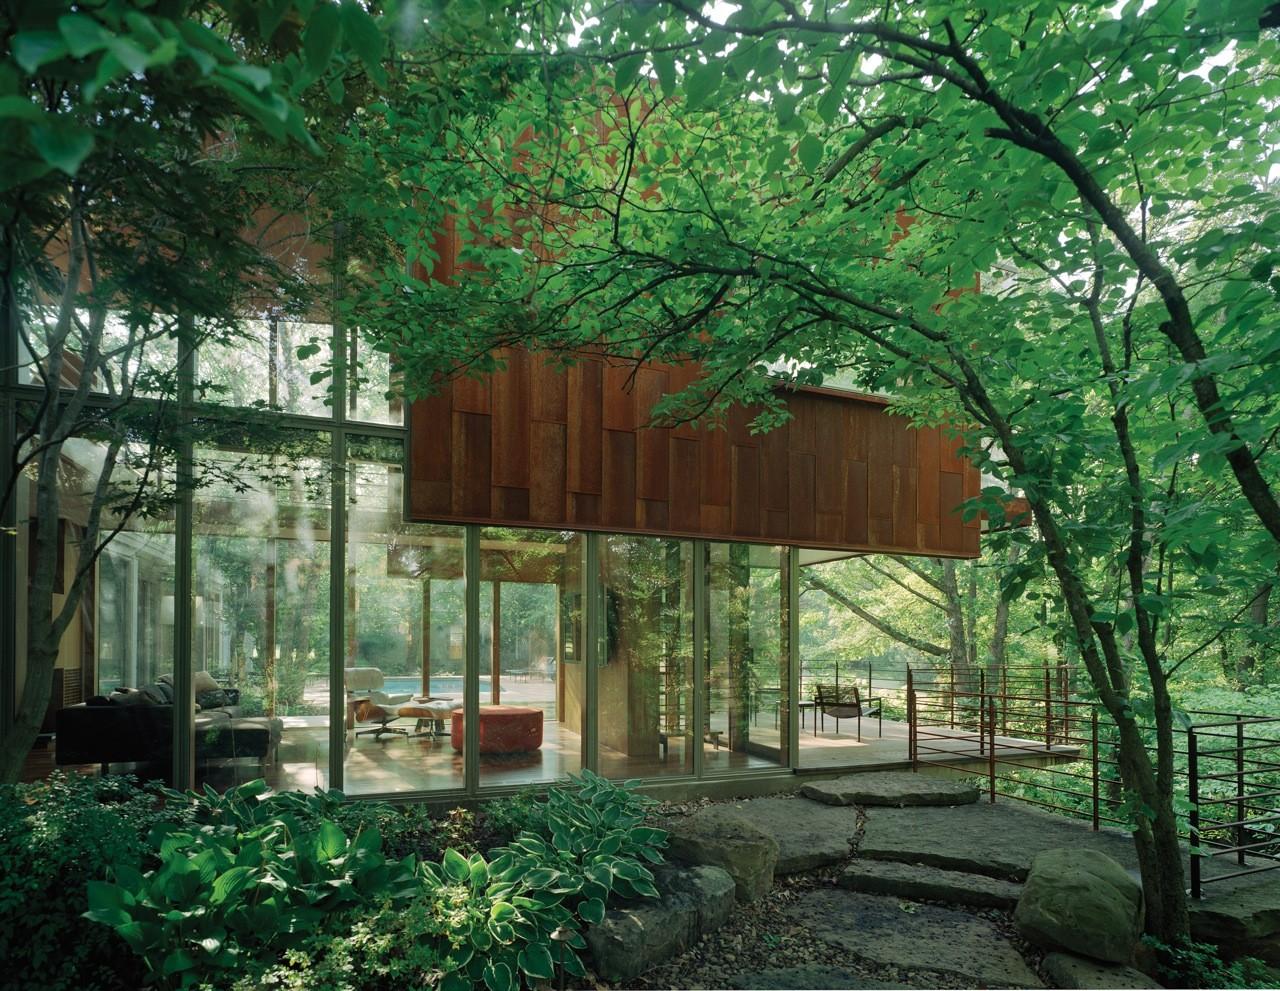 Arkansas House / Marlon Blackwell Architect, © Tim Hursley